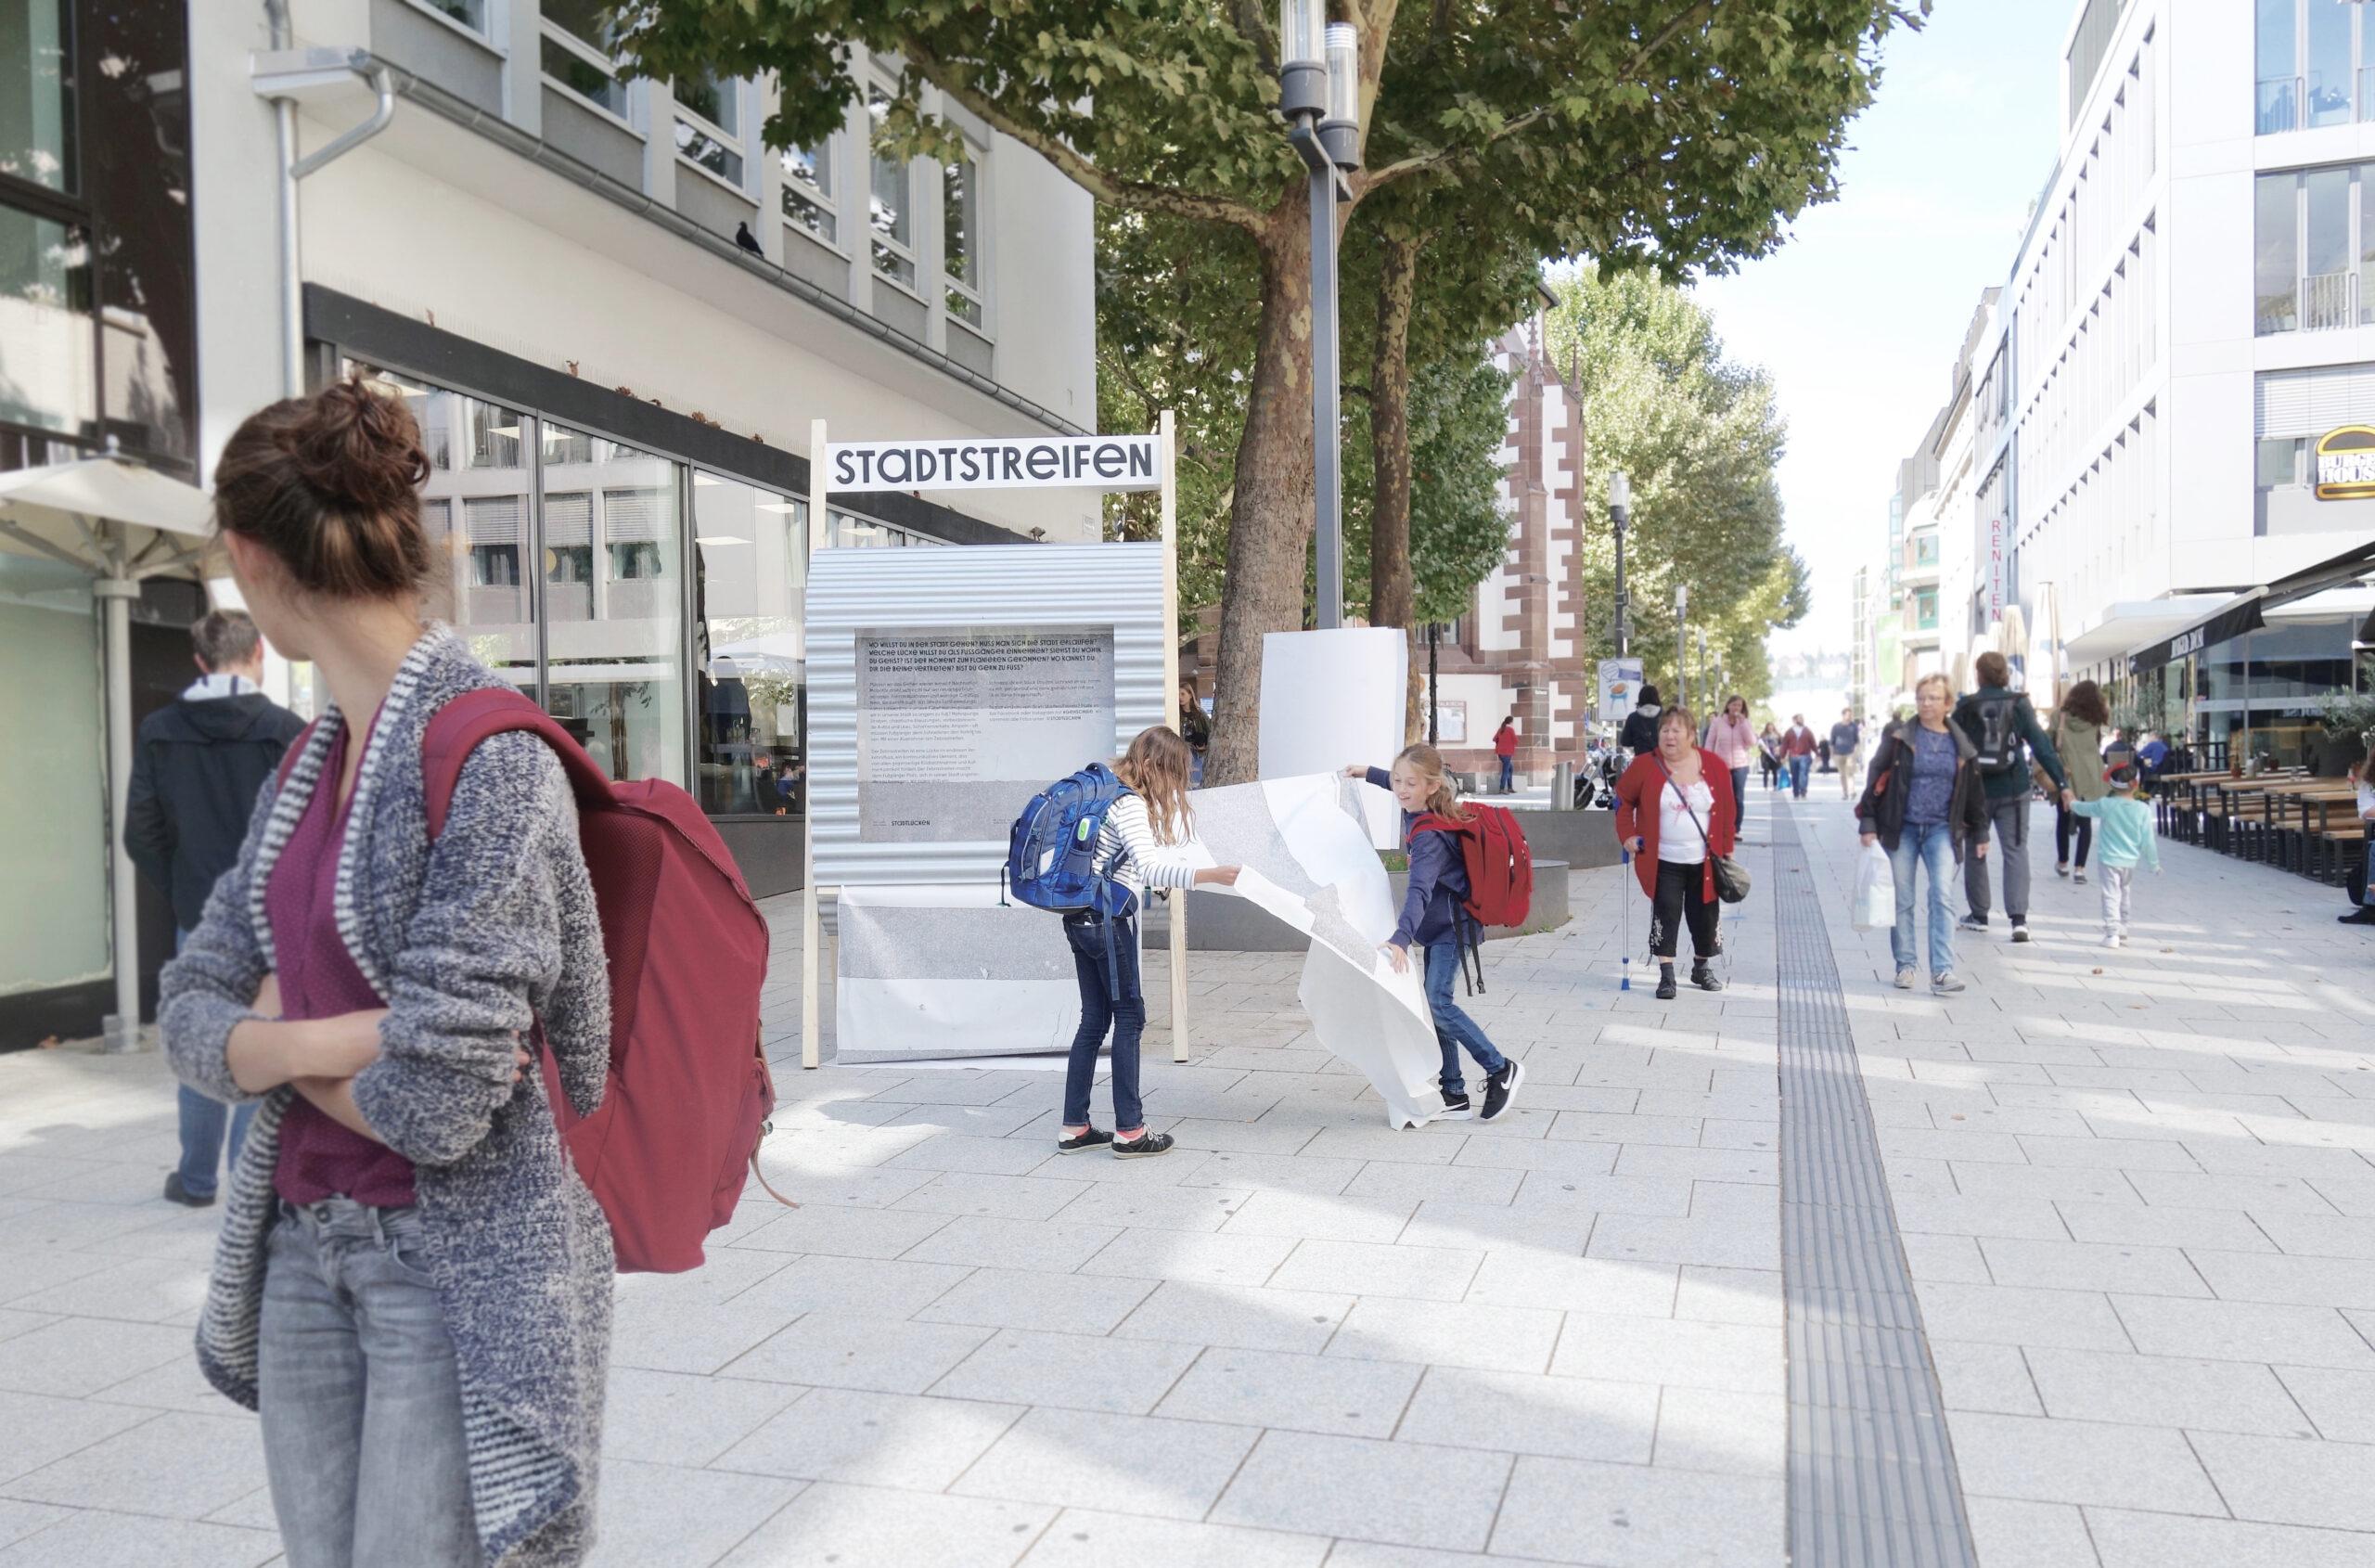 gehschule stadtstreifenautomat stadtlücken sebastian klawiter stuttgart stadtraum urban